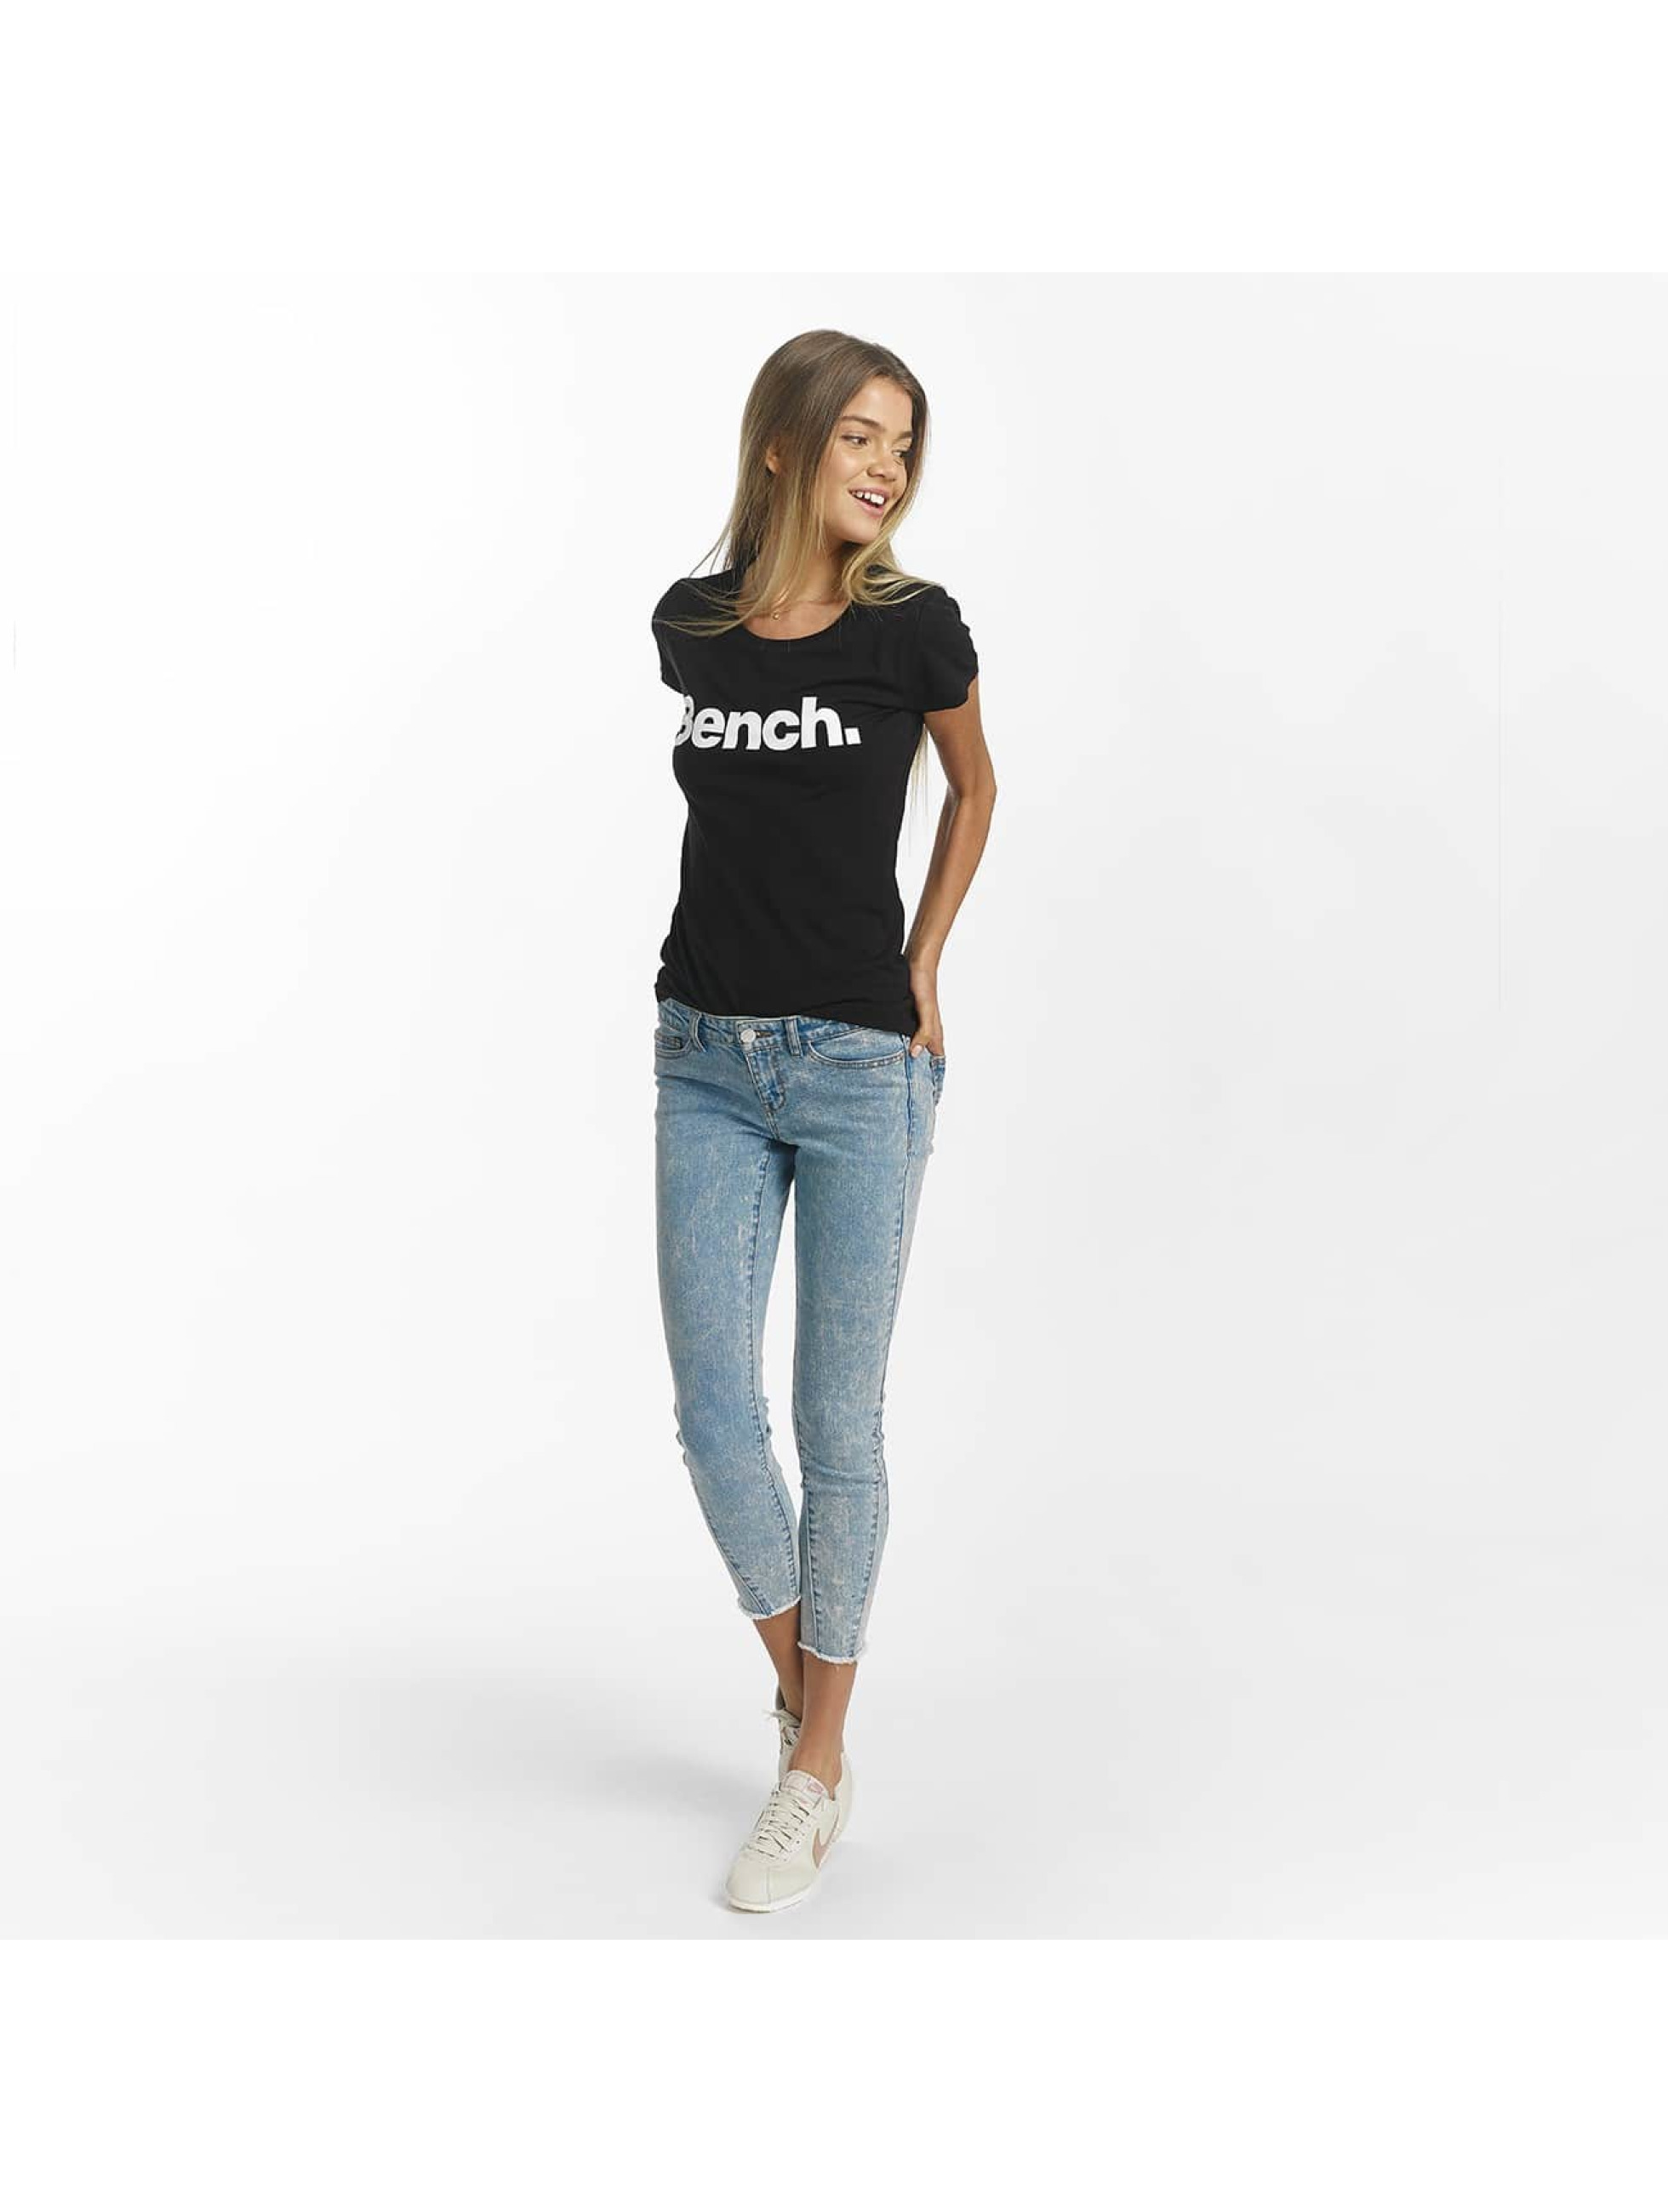 Bench T-Shirt Slim Logo schwarz